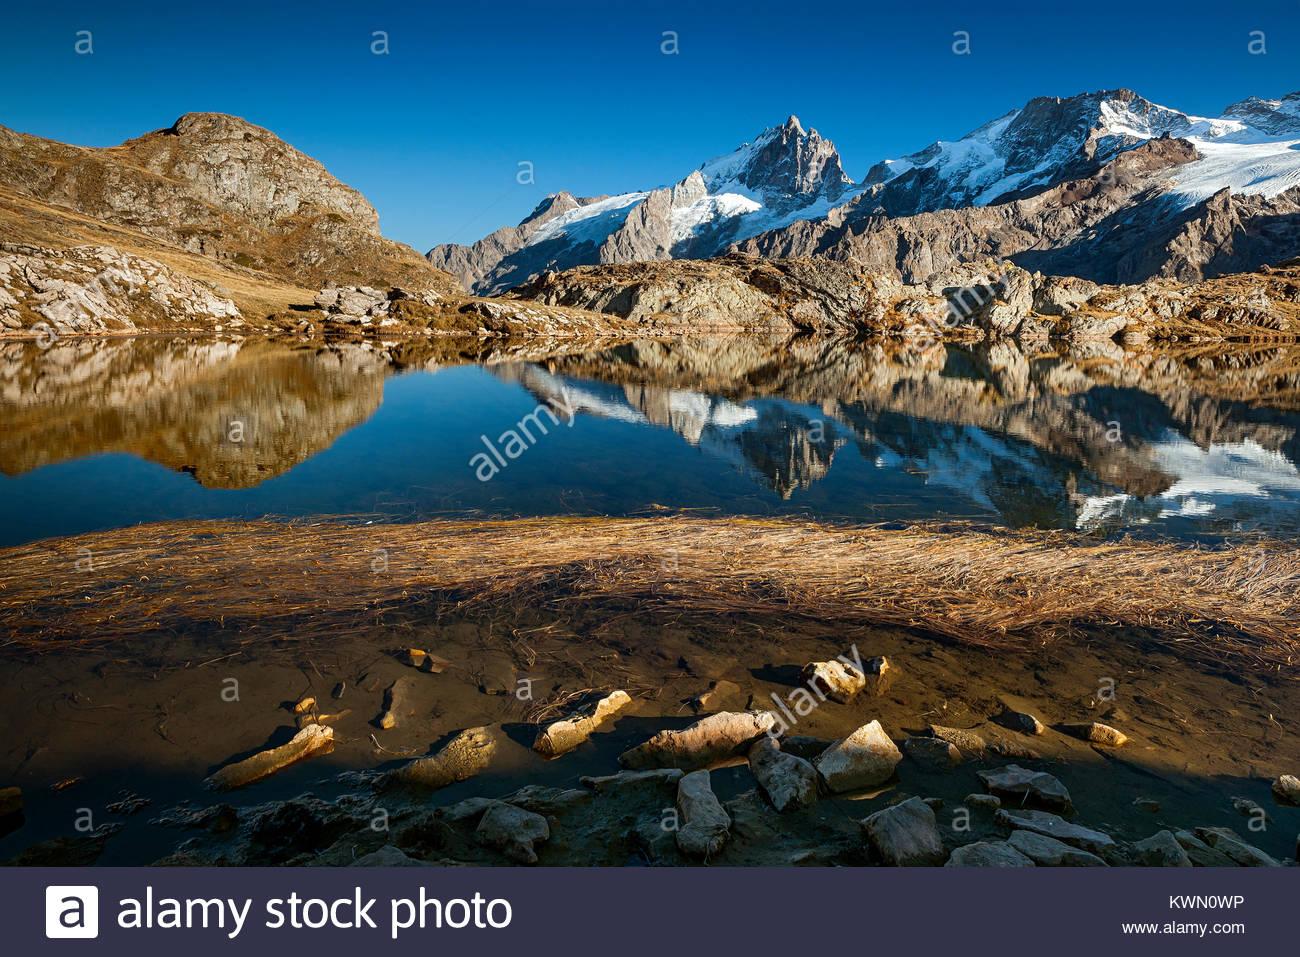 Lake Lérié reflecting La Meije north face in Oisans (Alps - France) Stock Photo